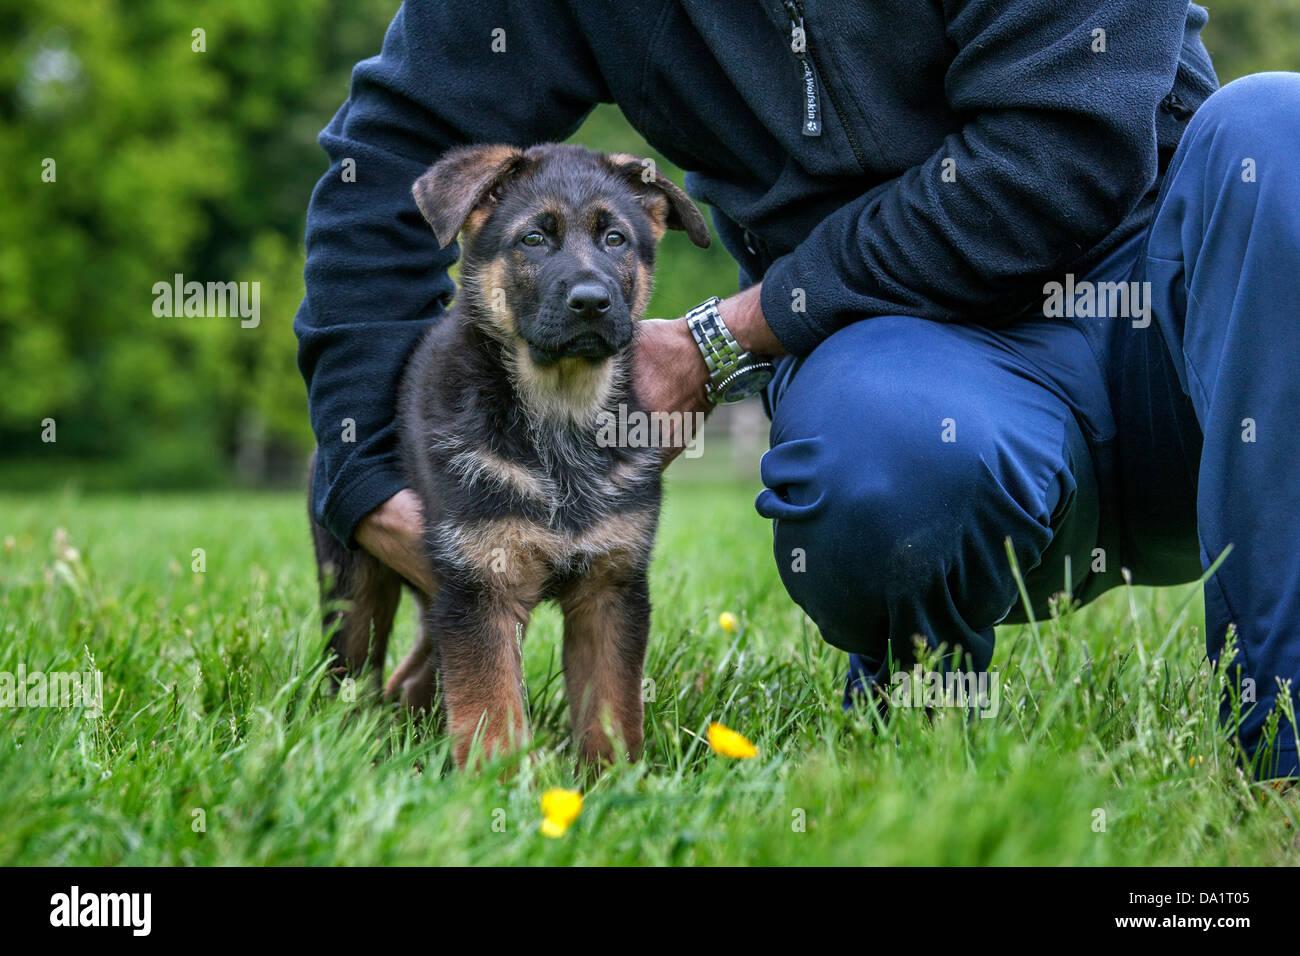 Owner holding Alsatian / German shepherd dog (Canis lupus familiaris) puppy in garden - Stock Image